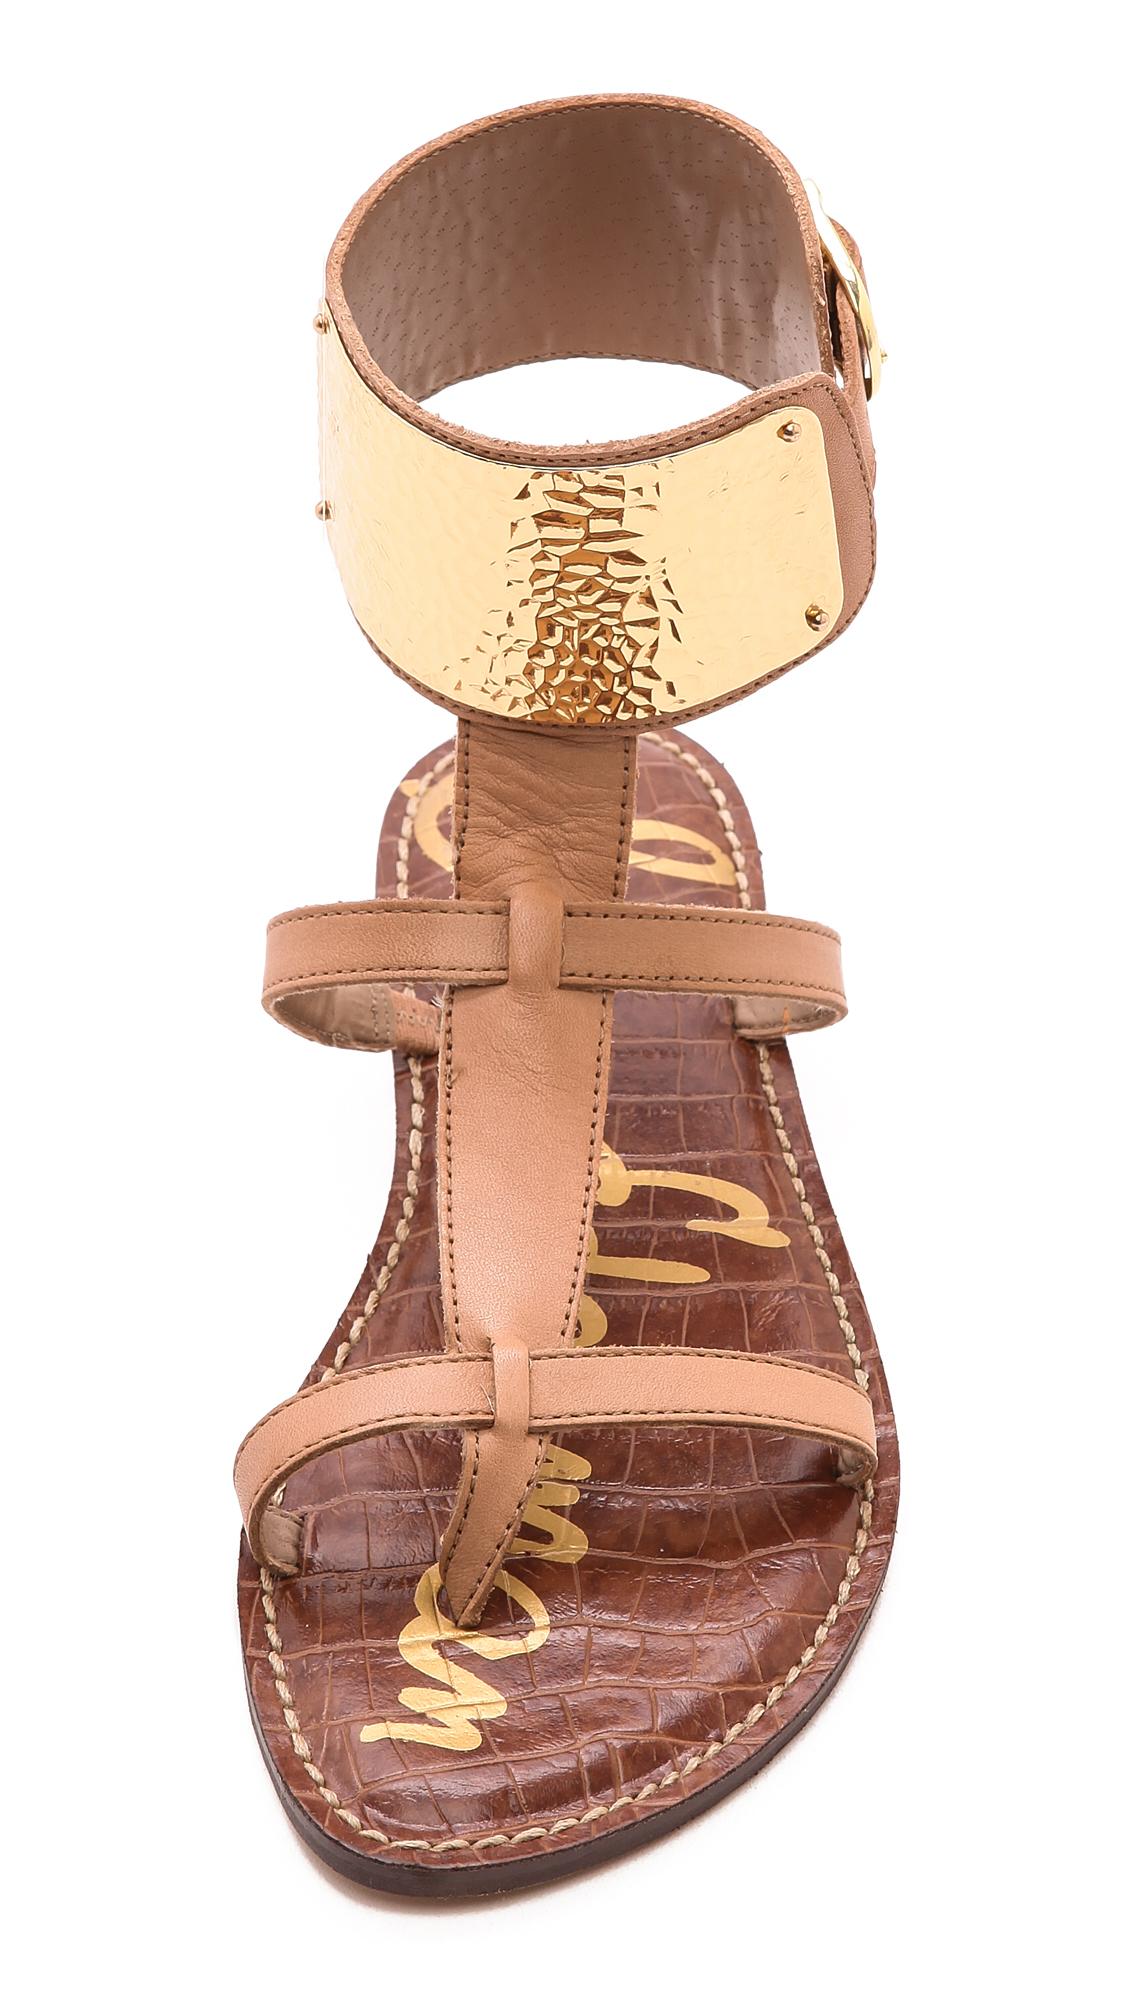 ac9d08cfa1ff Sam Edelman Genette Ankle Cuff Sandals